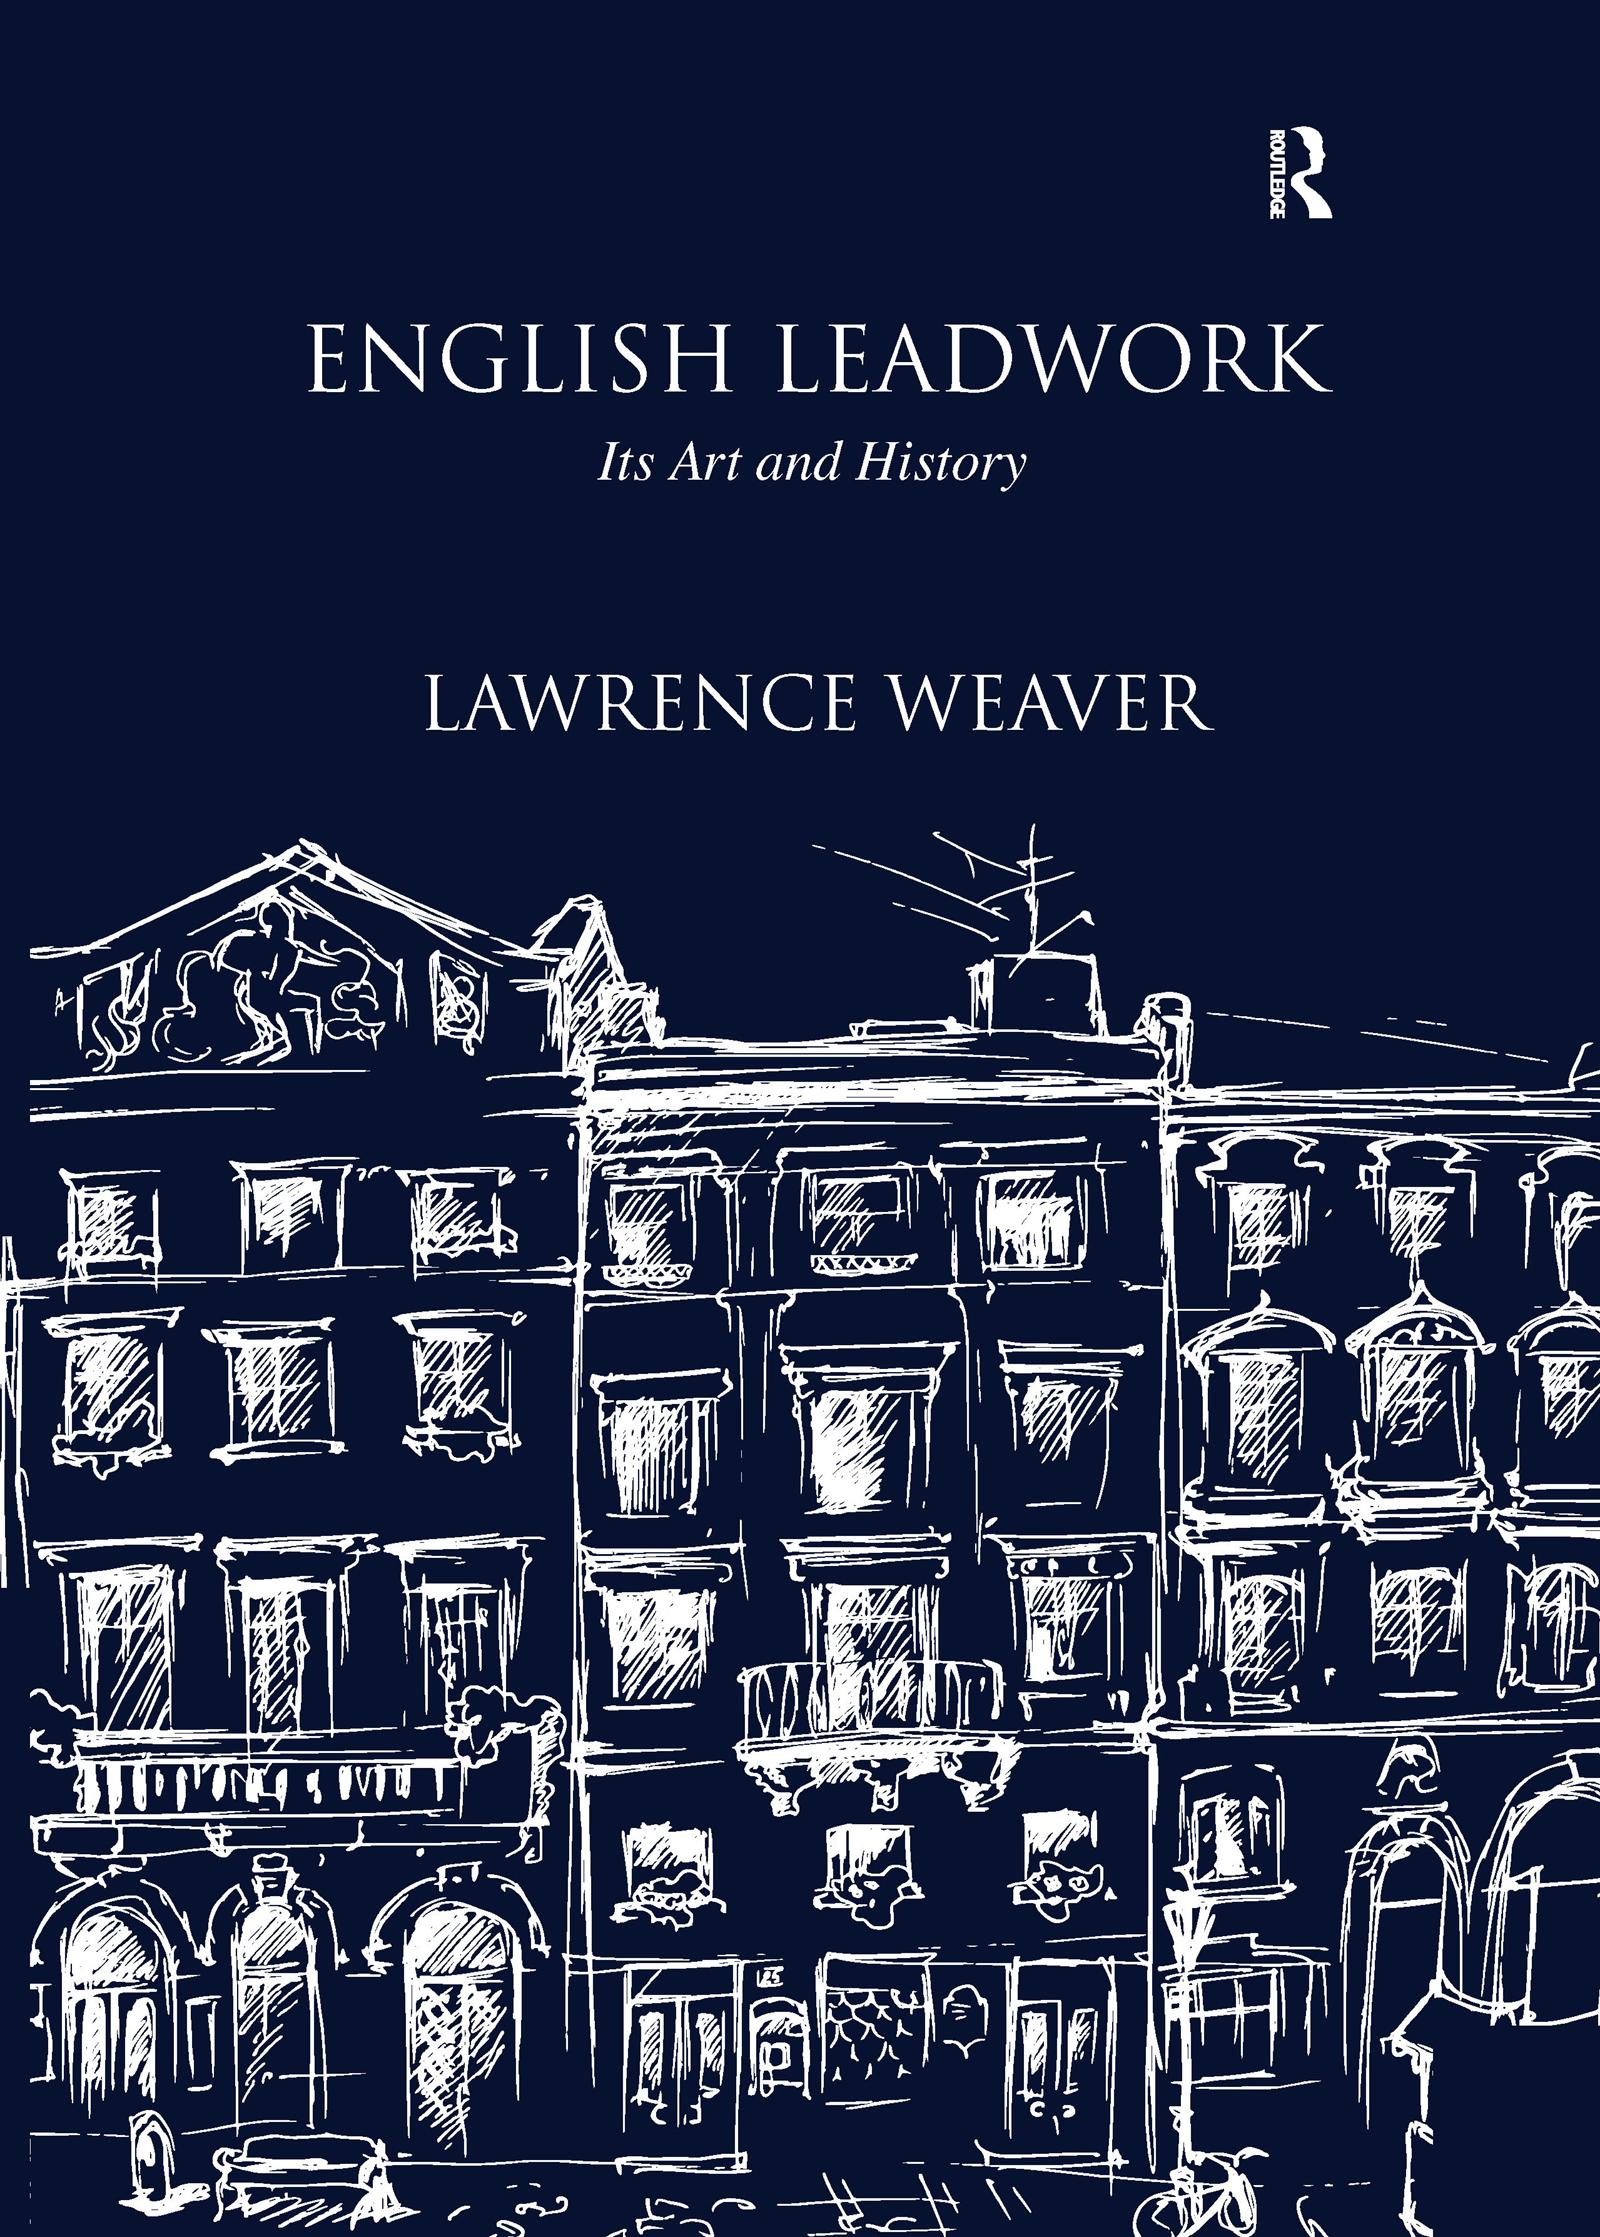 English Leadwork